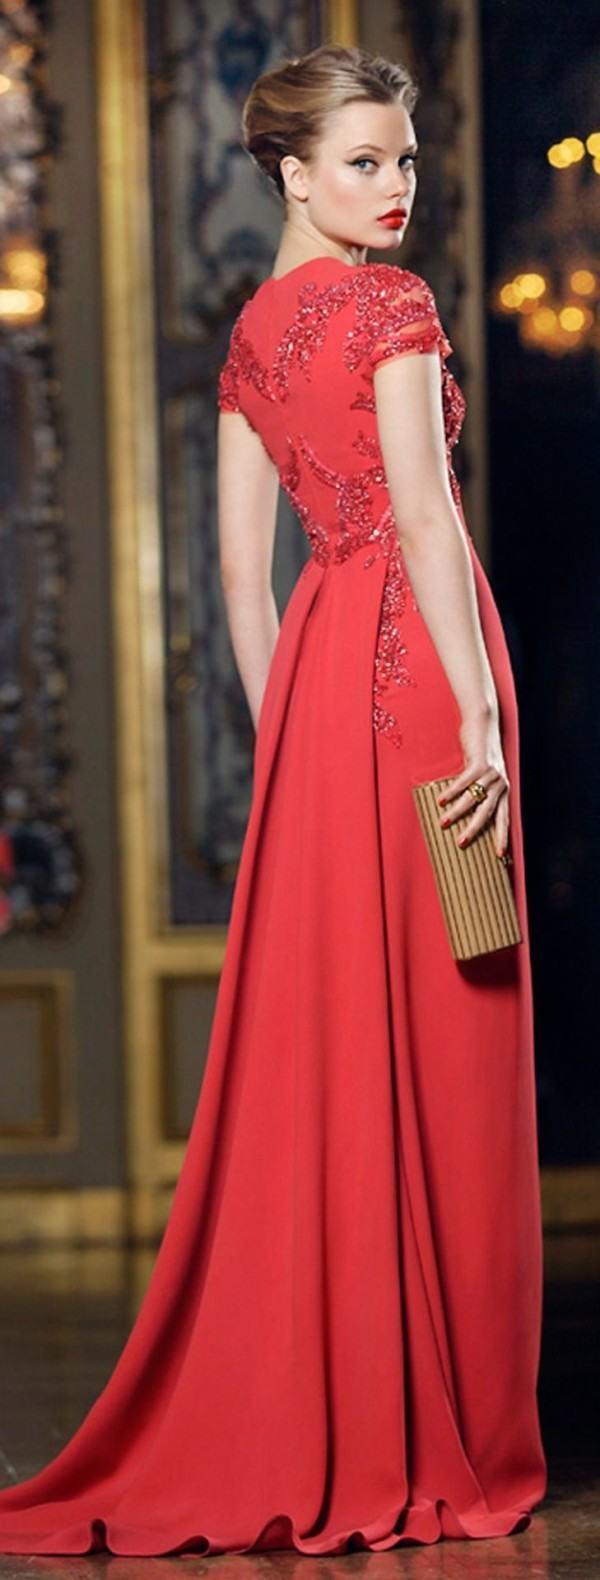 Como pintar un vestido rojo a negro